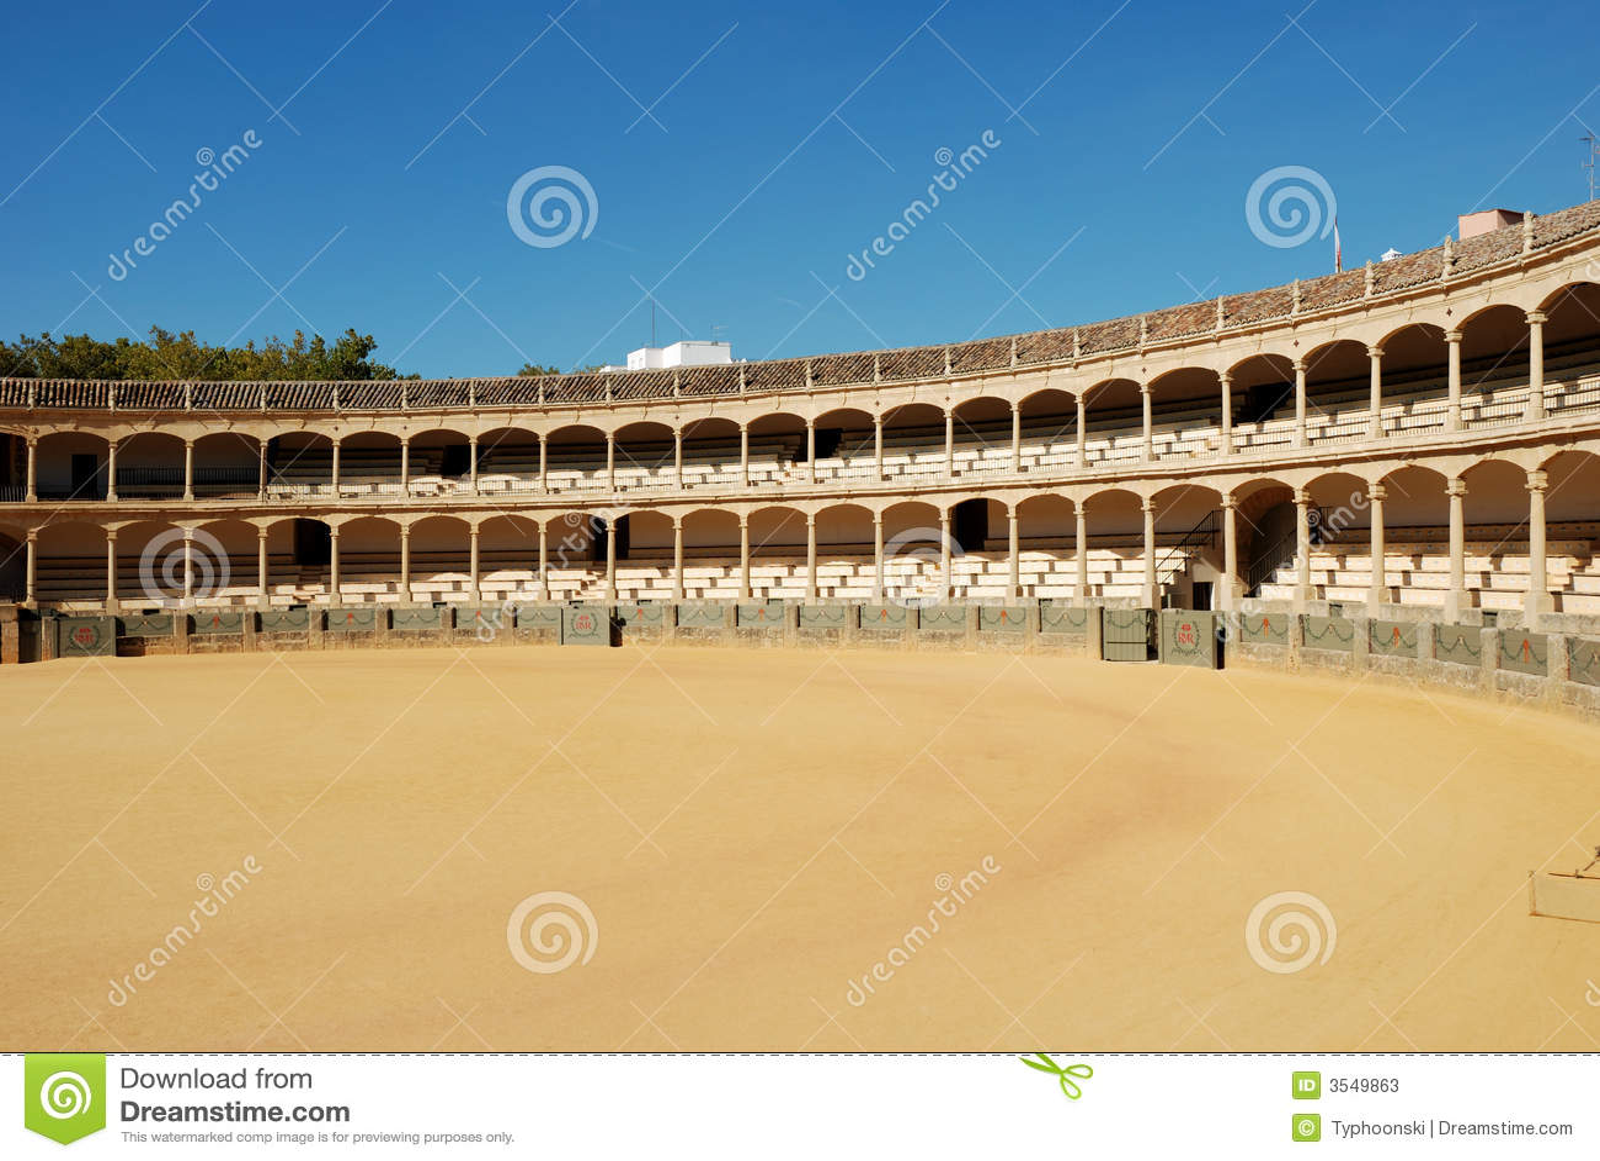 Arena de la tauromaquia en Ronda